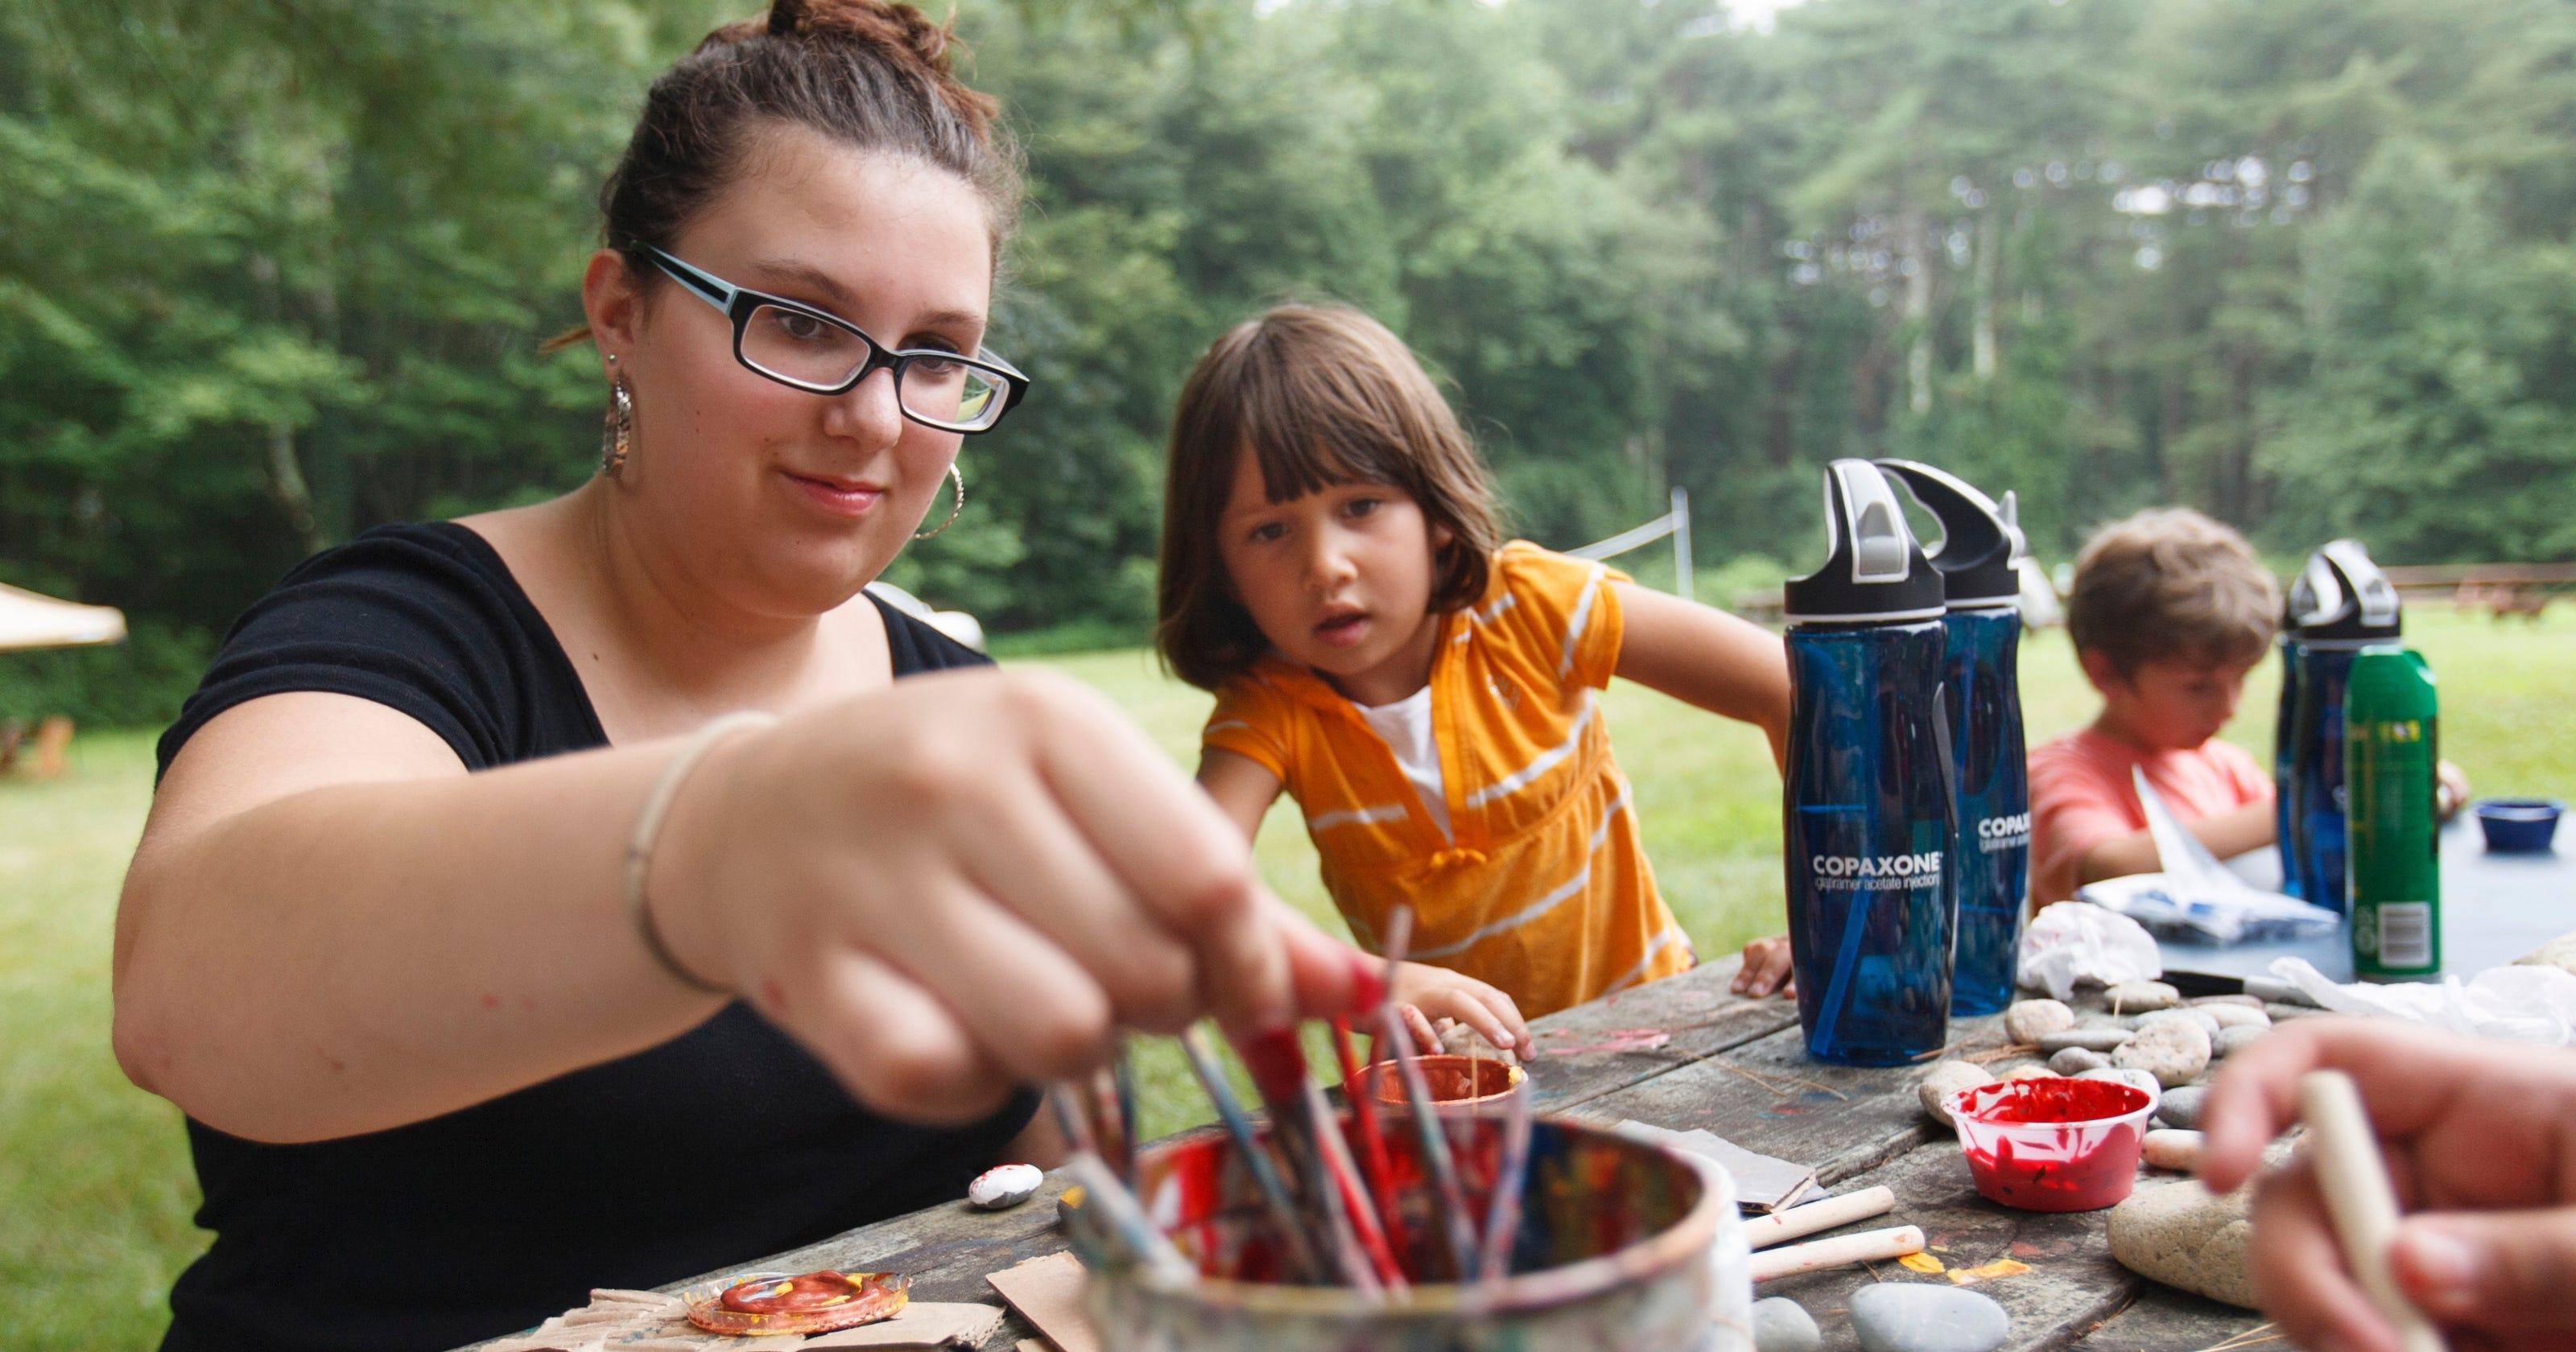 multiple sclerosis in children rare